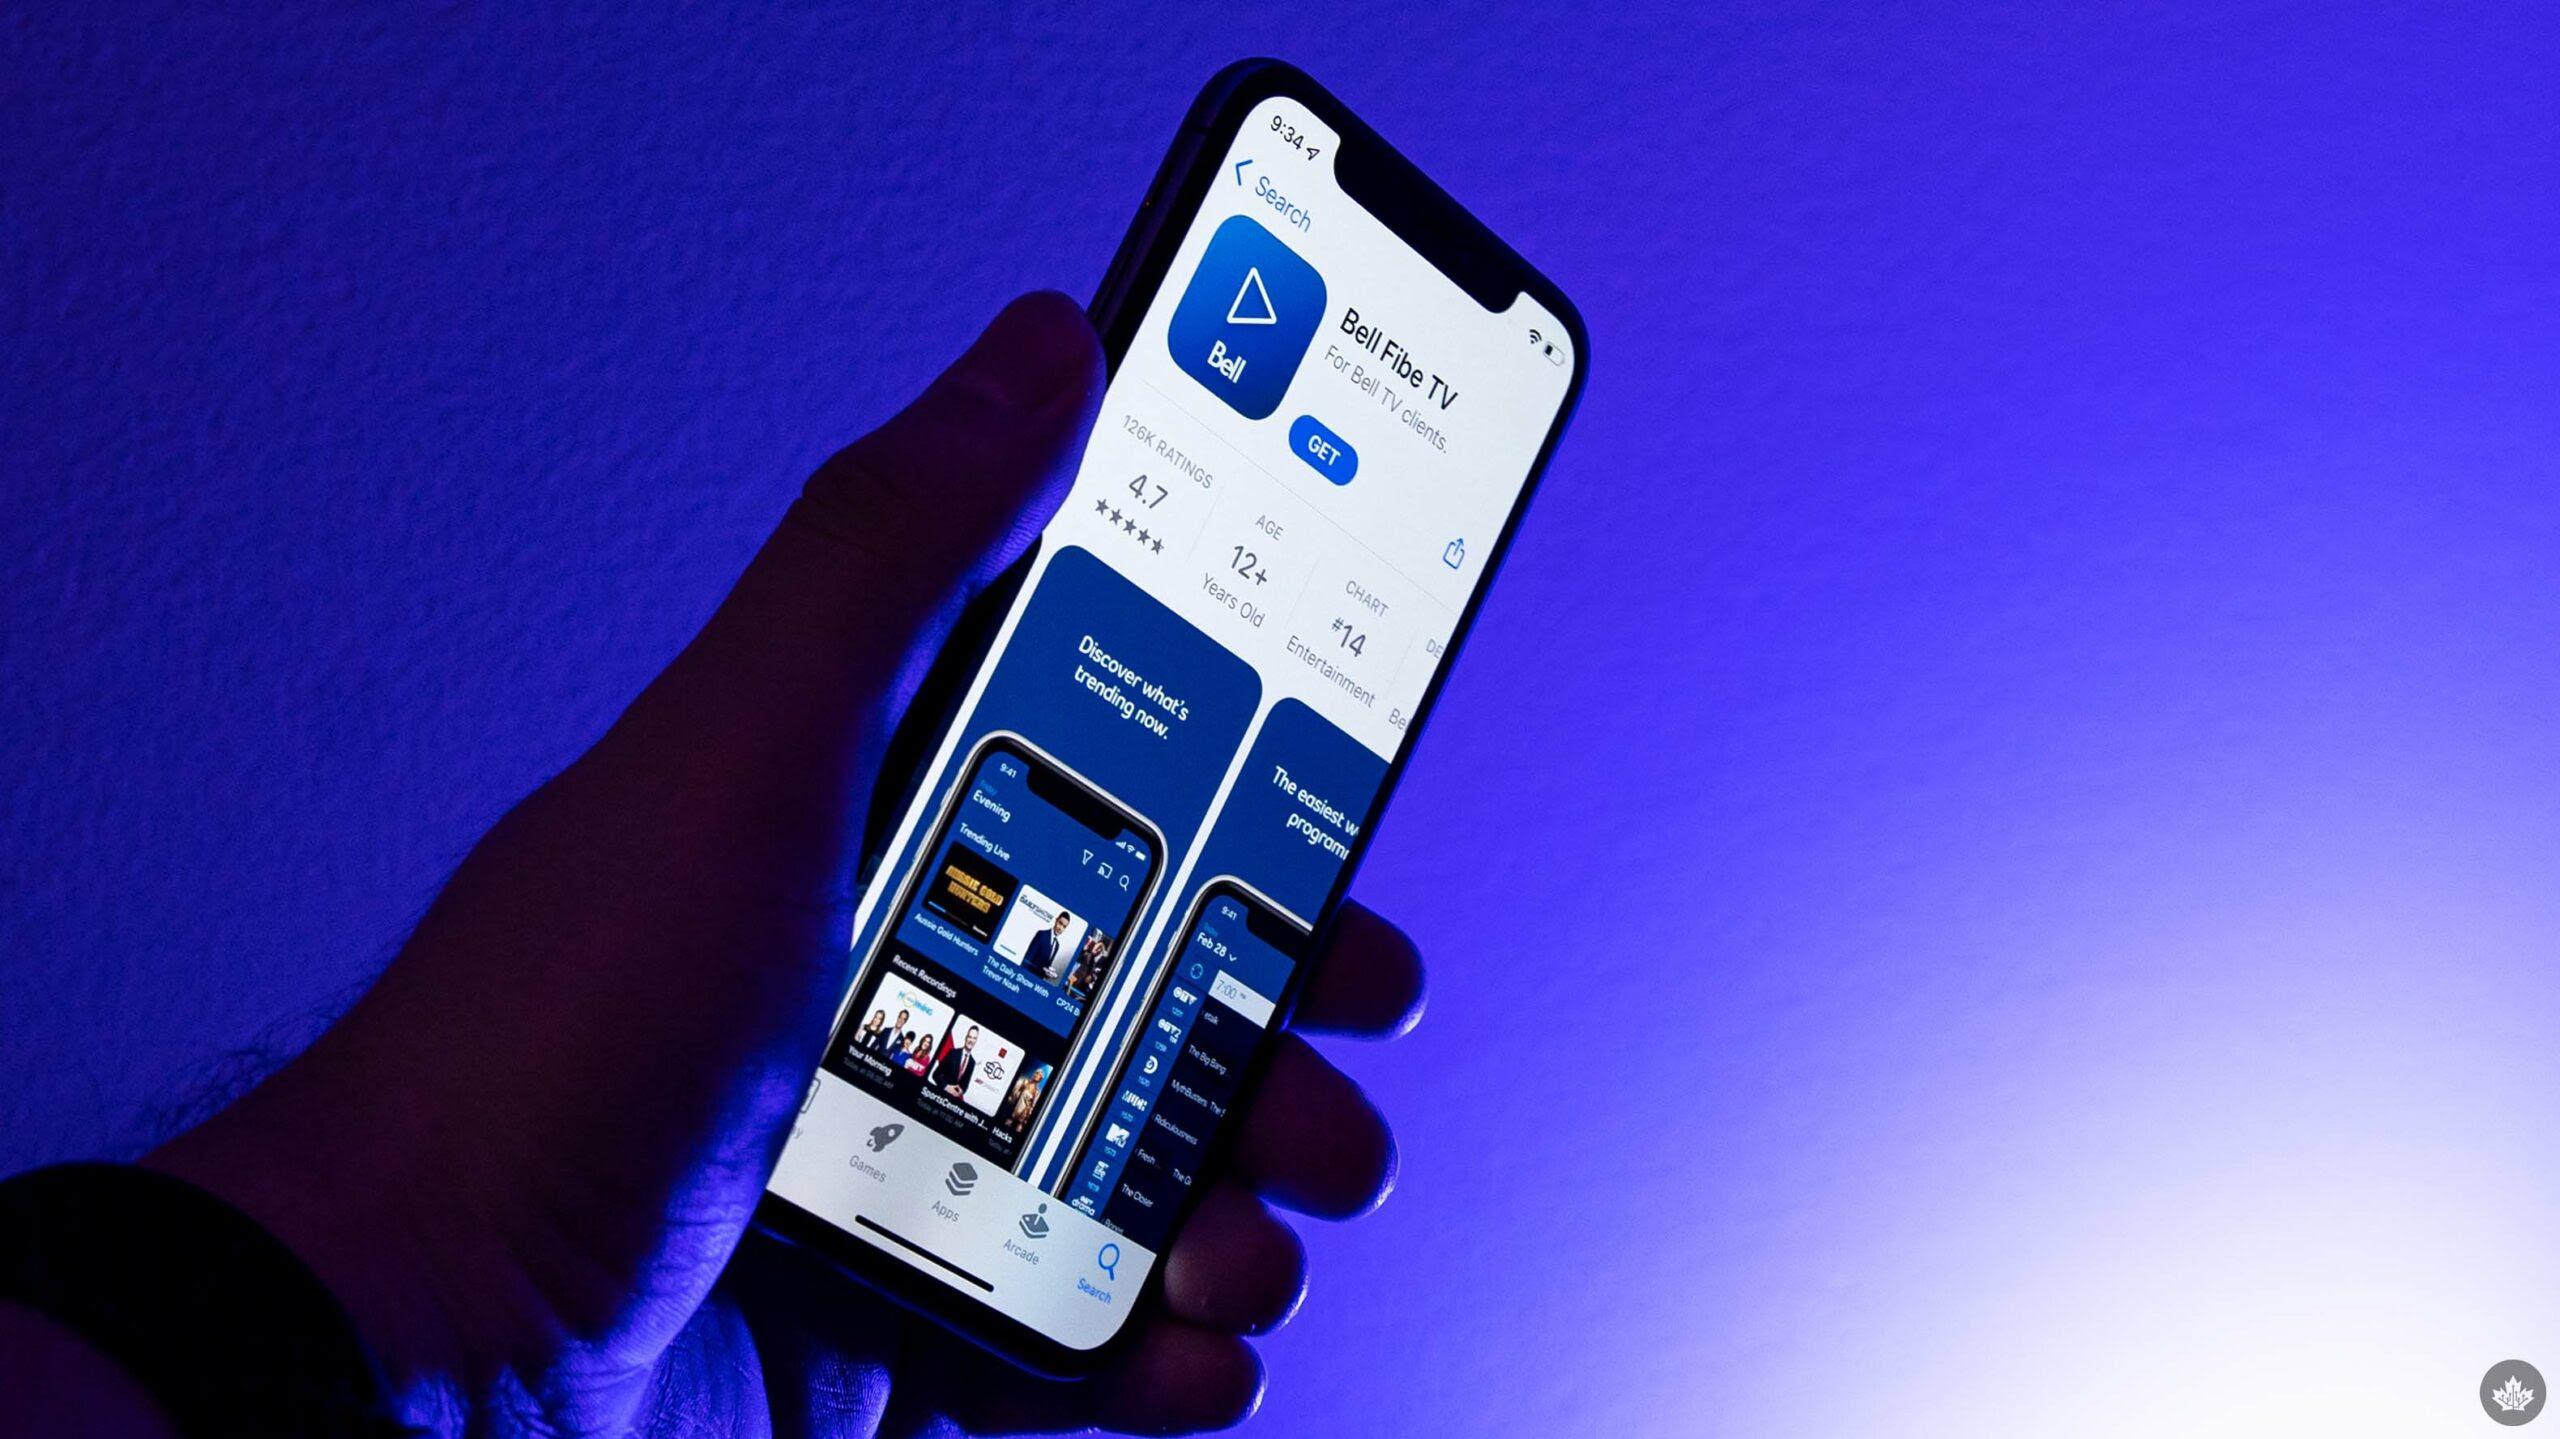 Bell improves rewind, fast-forward controls on Fibe TV iOS app